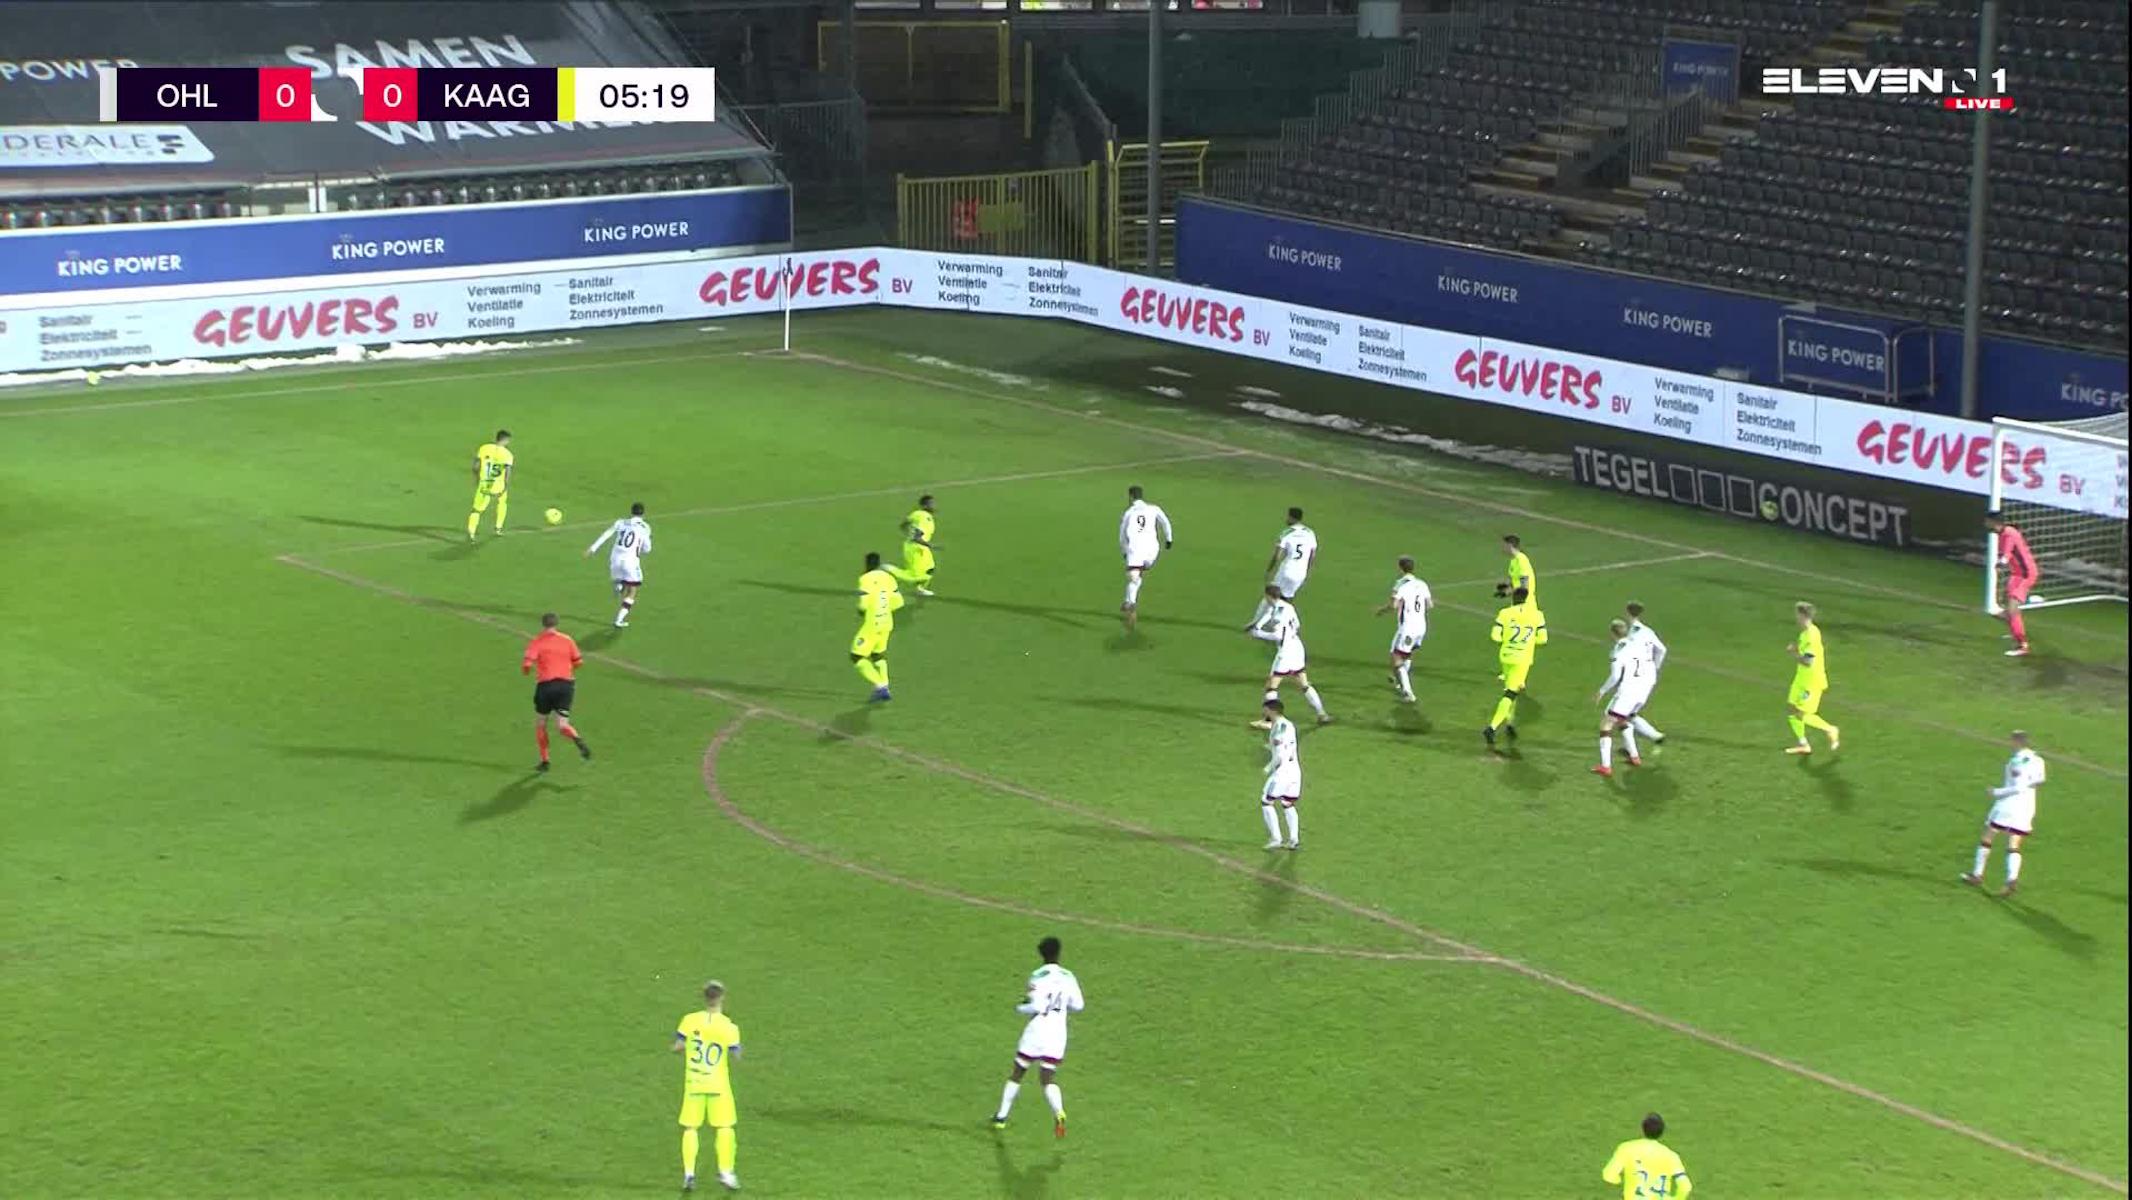 Doelpunt Milad Mohammadi (OH Leuven vs. KAA Gent)